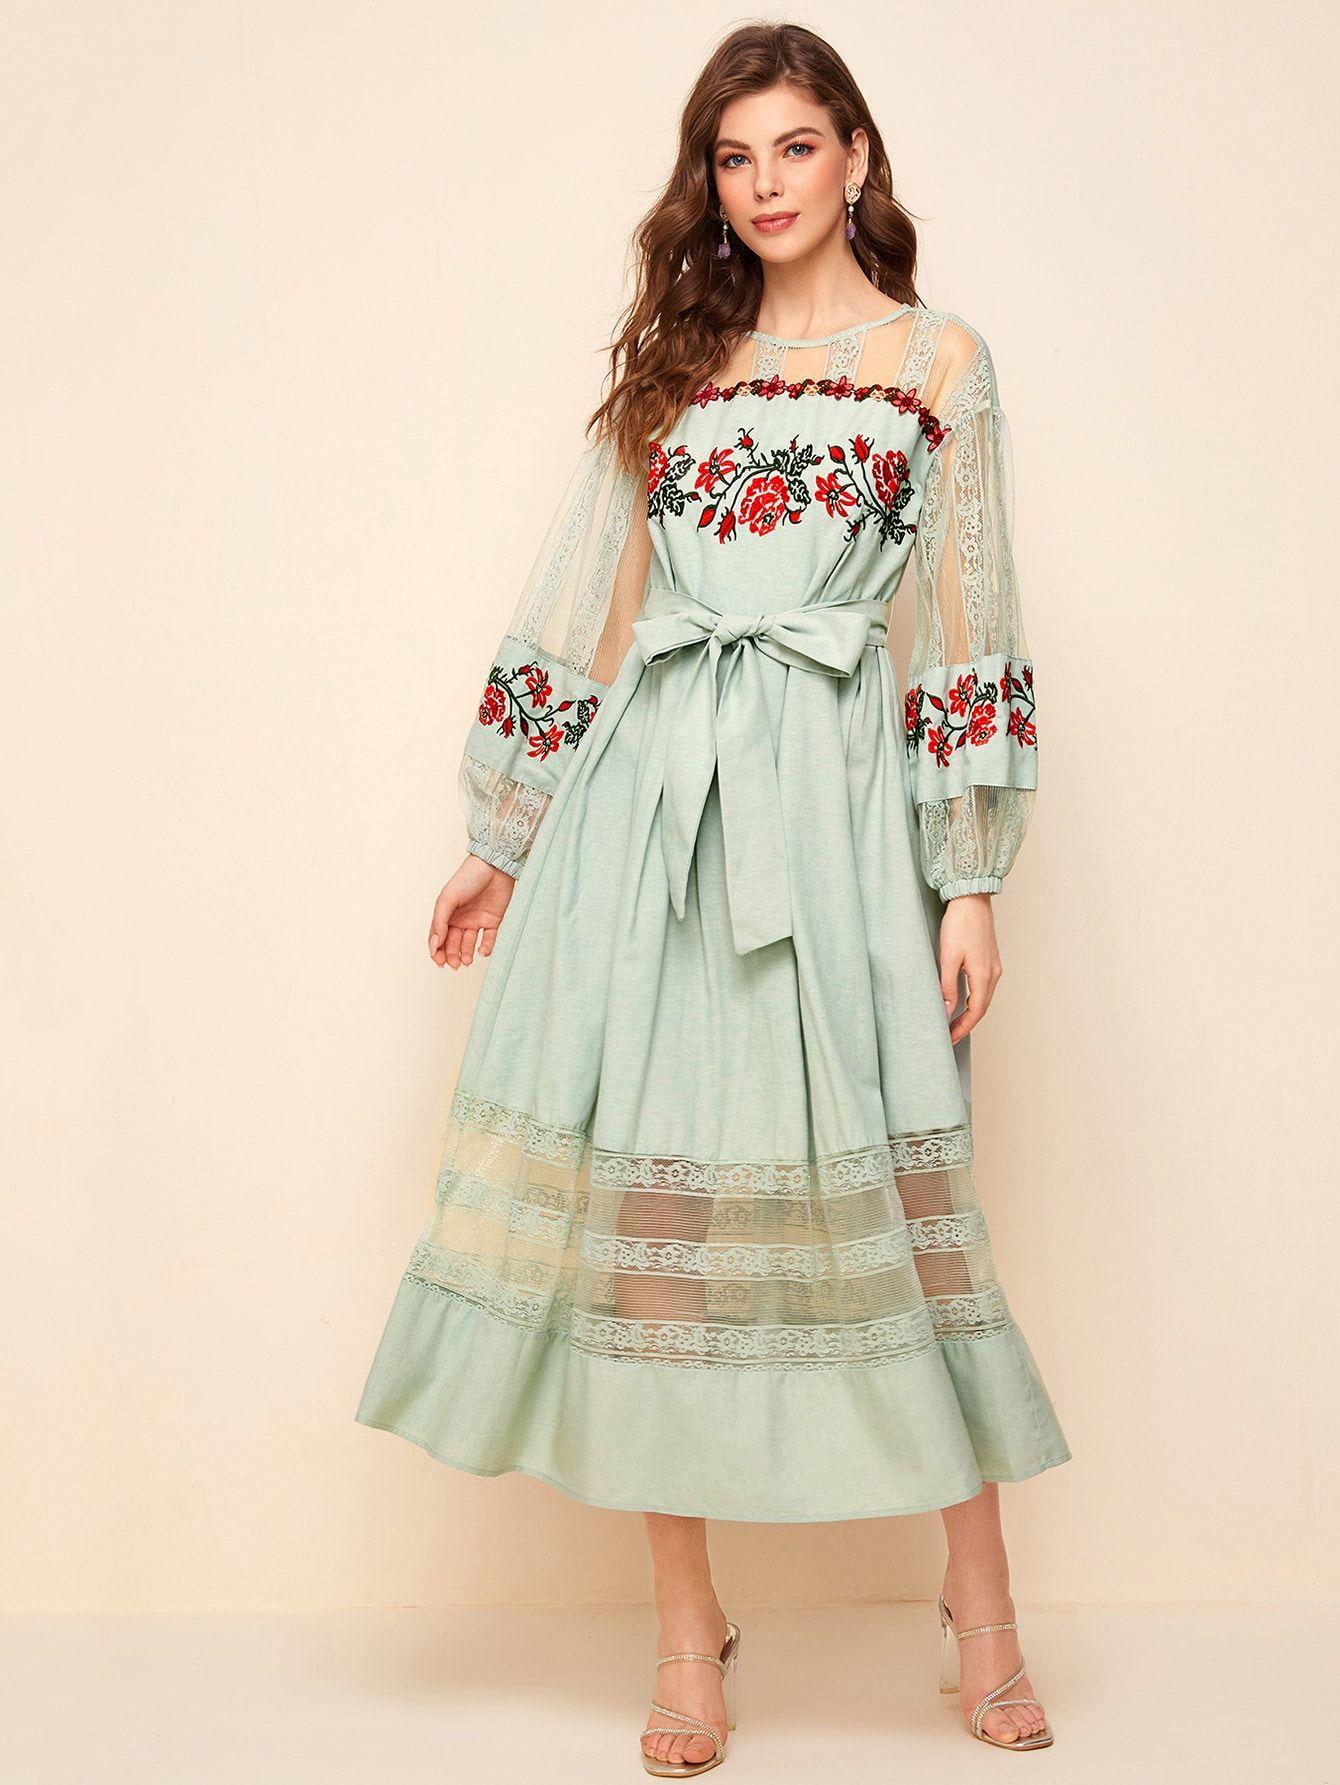 Lace Insert Lantern Sleeve Embroidered Dress With Belt Embroidered Dress Women S Fashion Dresses Dresses [ 1785 x 1340 Pixel ]